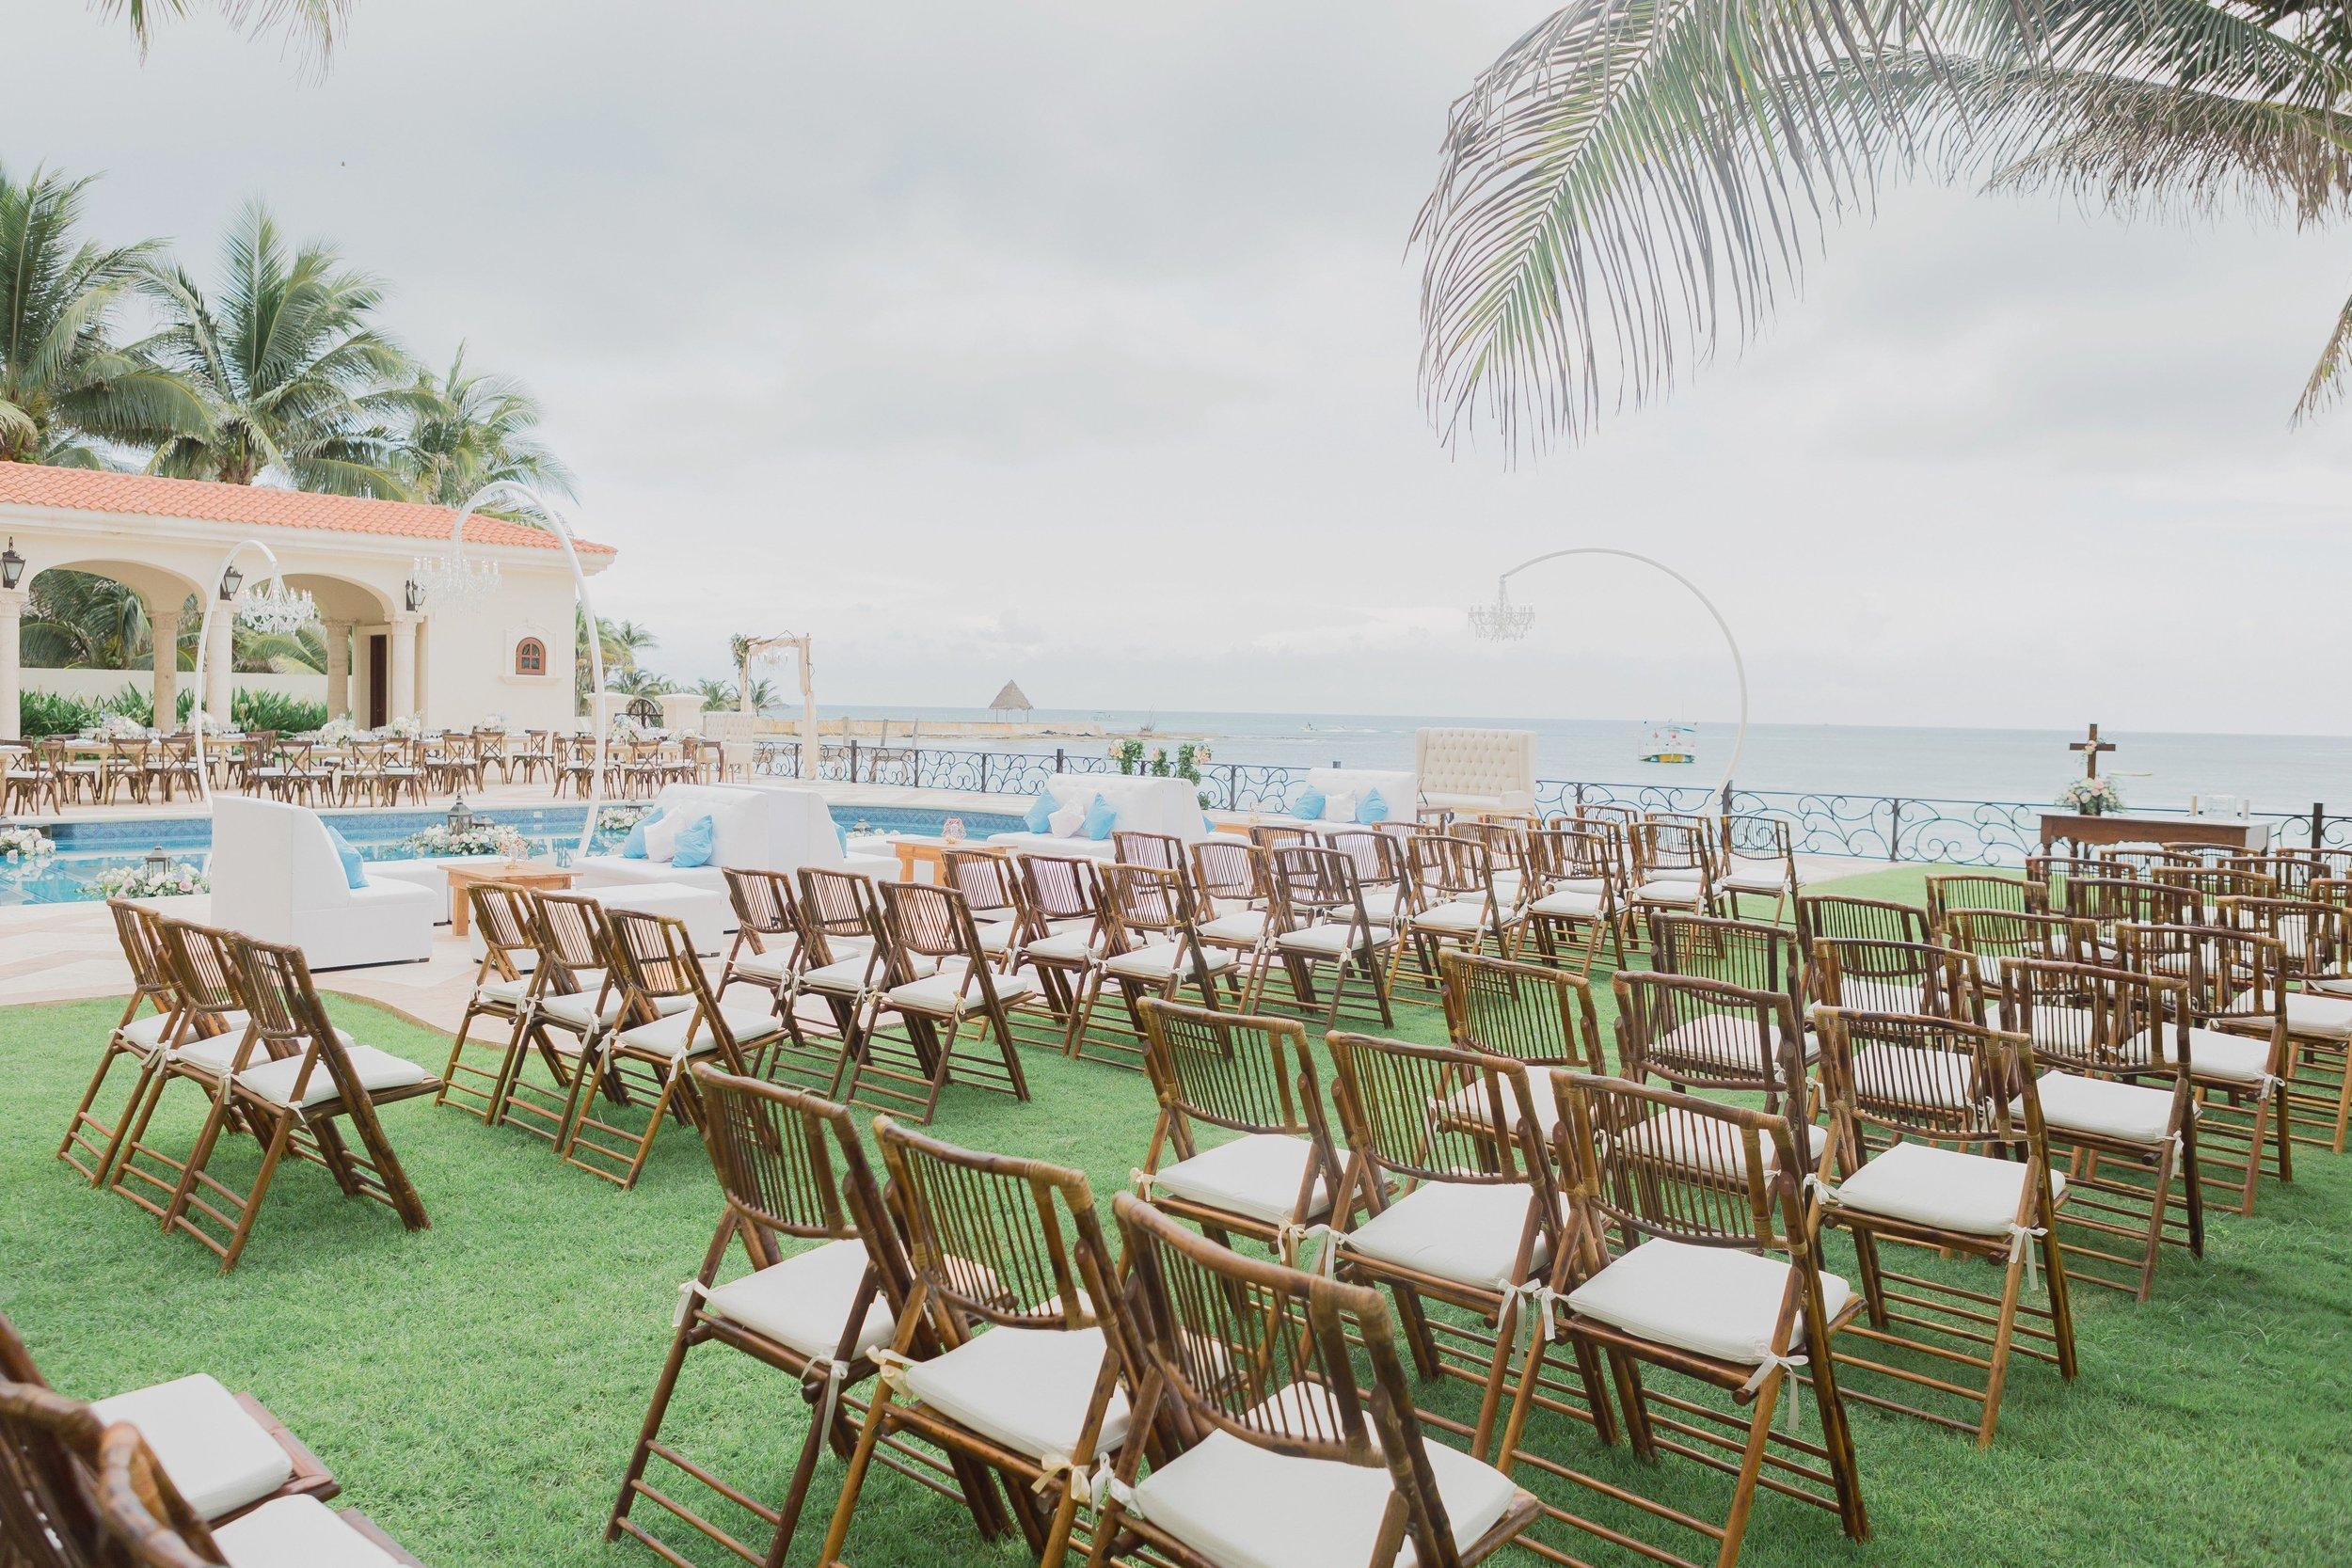 cancun-wedding-venue-villa-la-joya-82 copy-websize.jpg